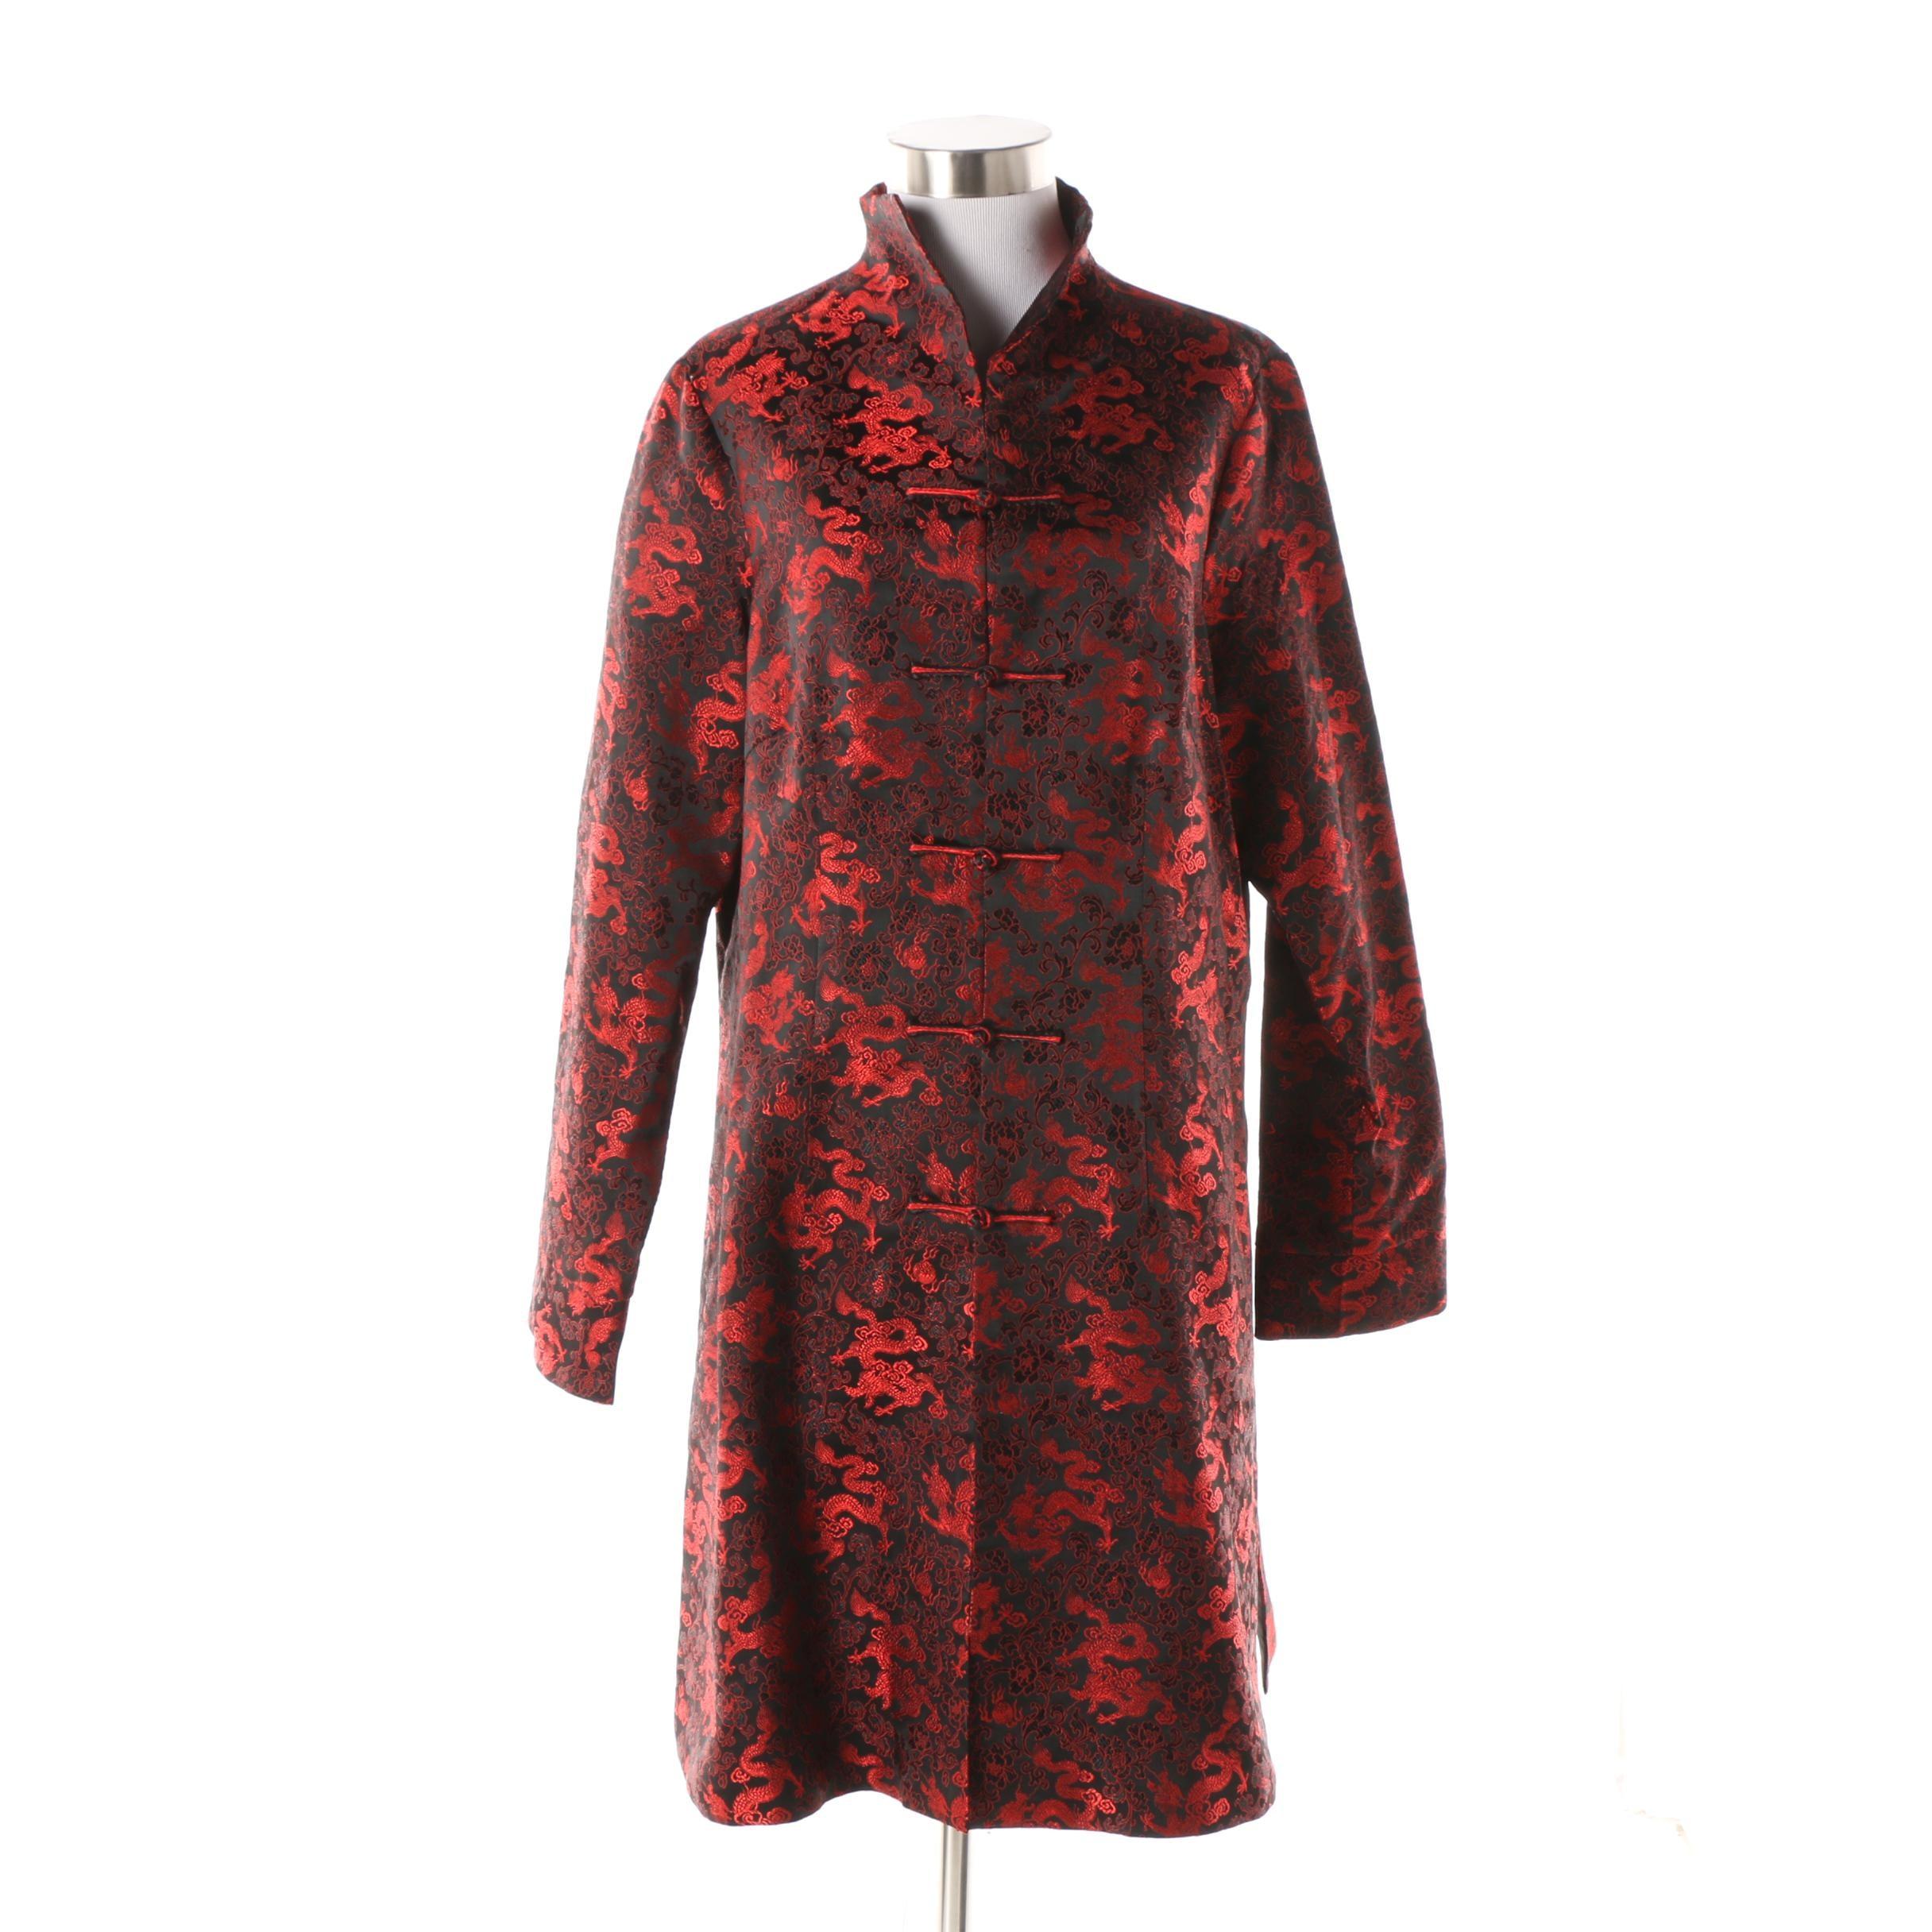 Chinese Dragon Silk Jacket in Silk Brocade with Dragon Motif